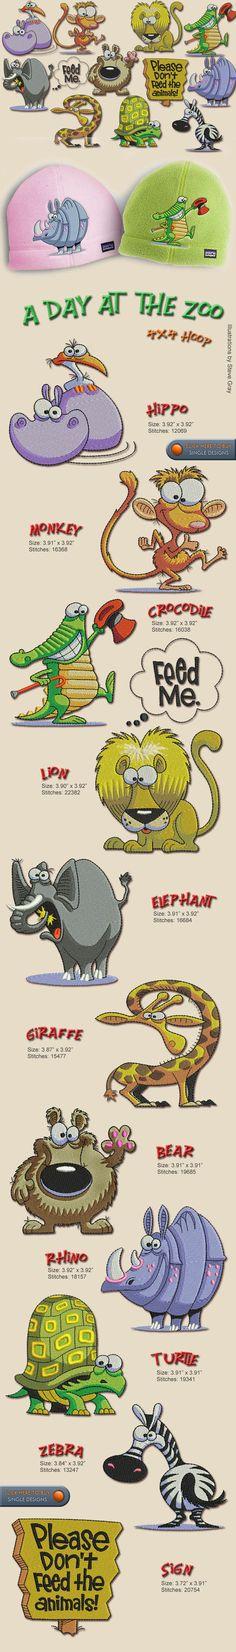 4x4 hoop ANIMAL,ZOO,ELEPHANT,MONKEY,LION,RHINO,HIPPO,ZEBRA,TURTLE, Embroidery Designs Free Embroidery Design Patterns Applique